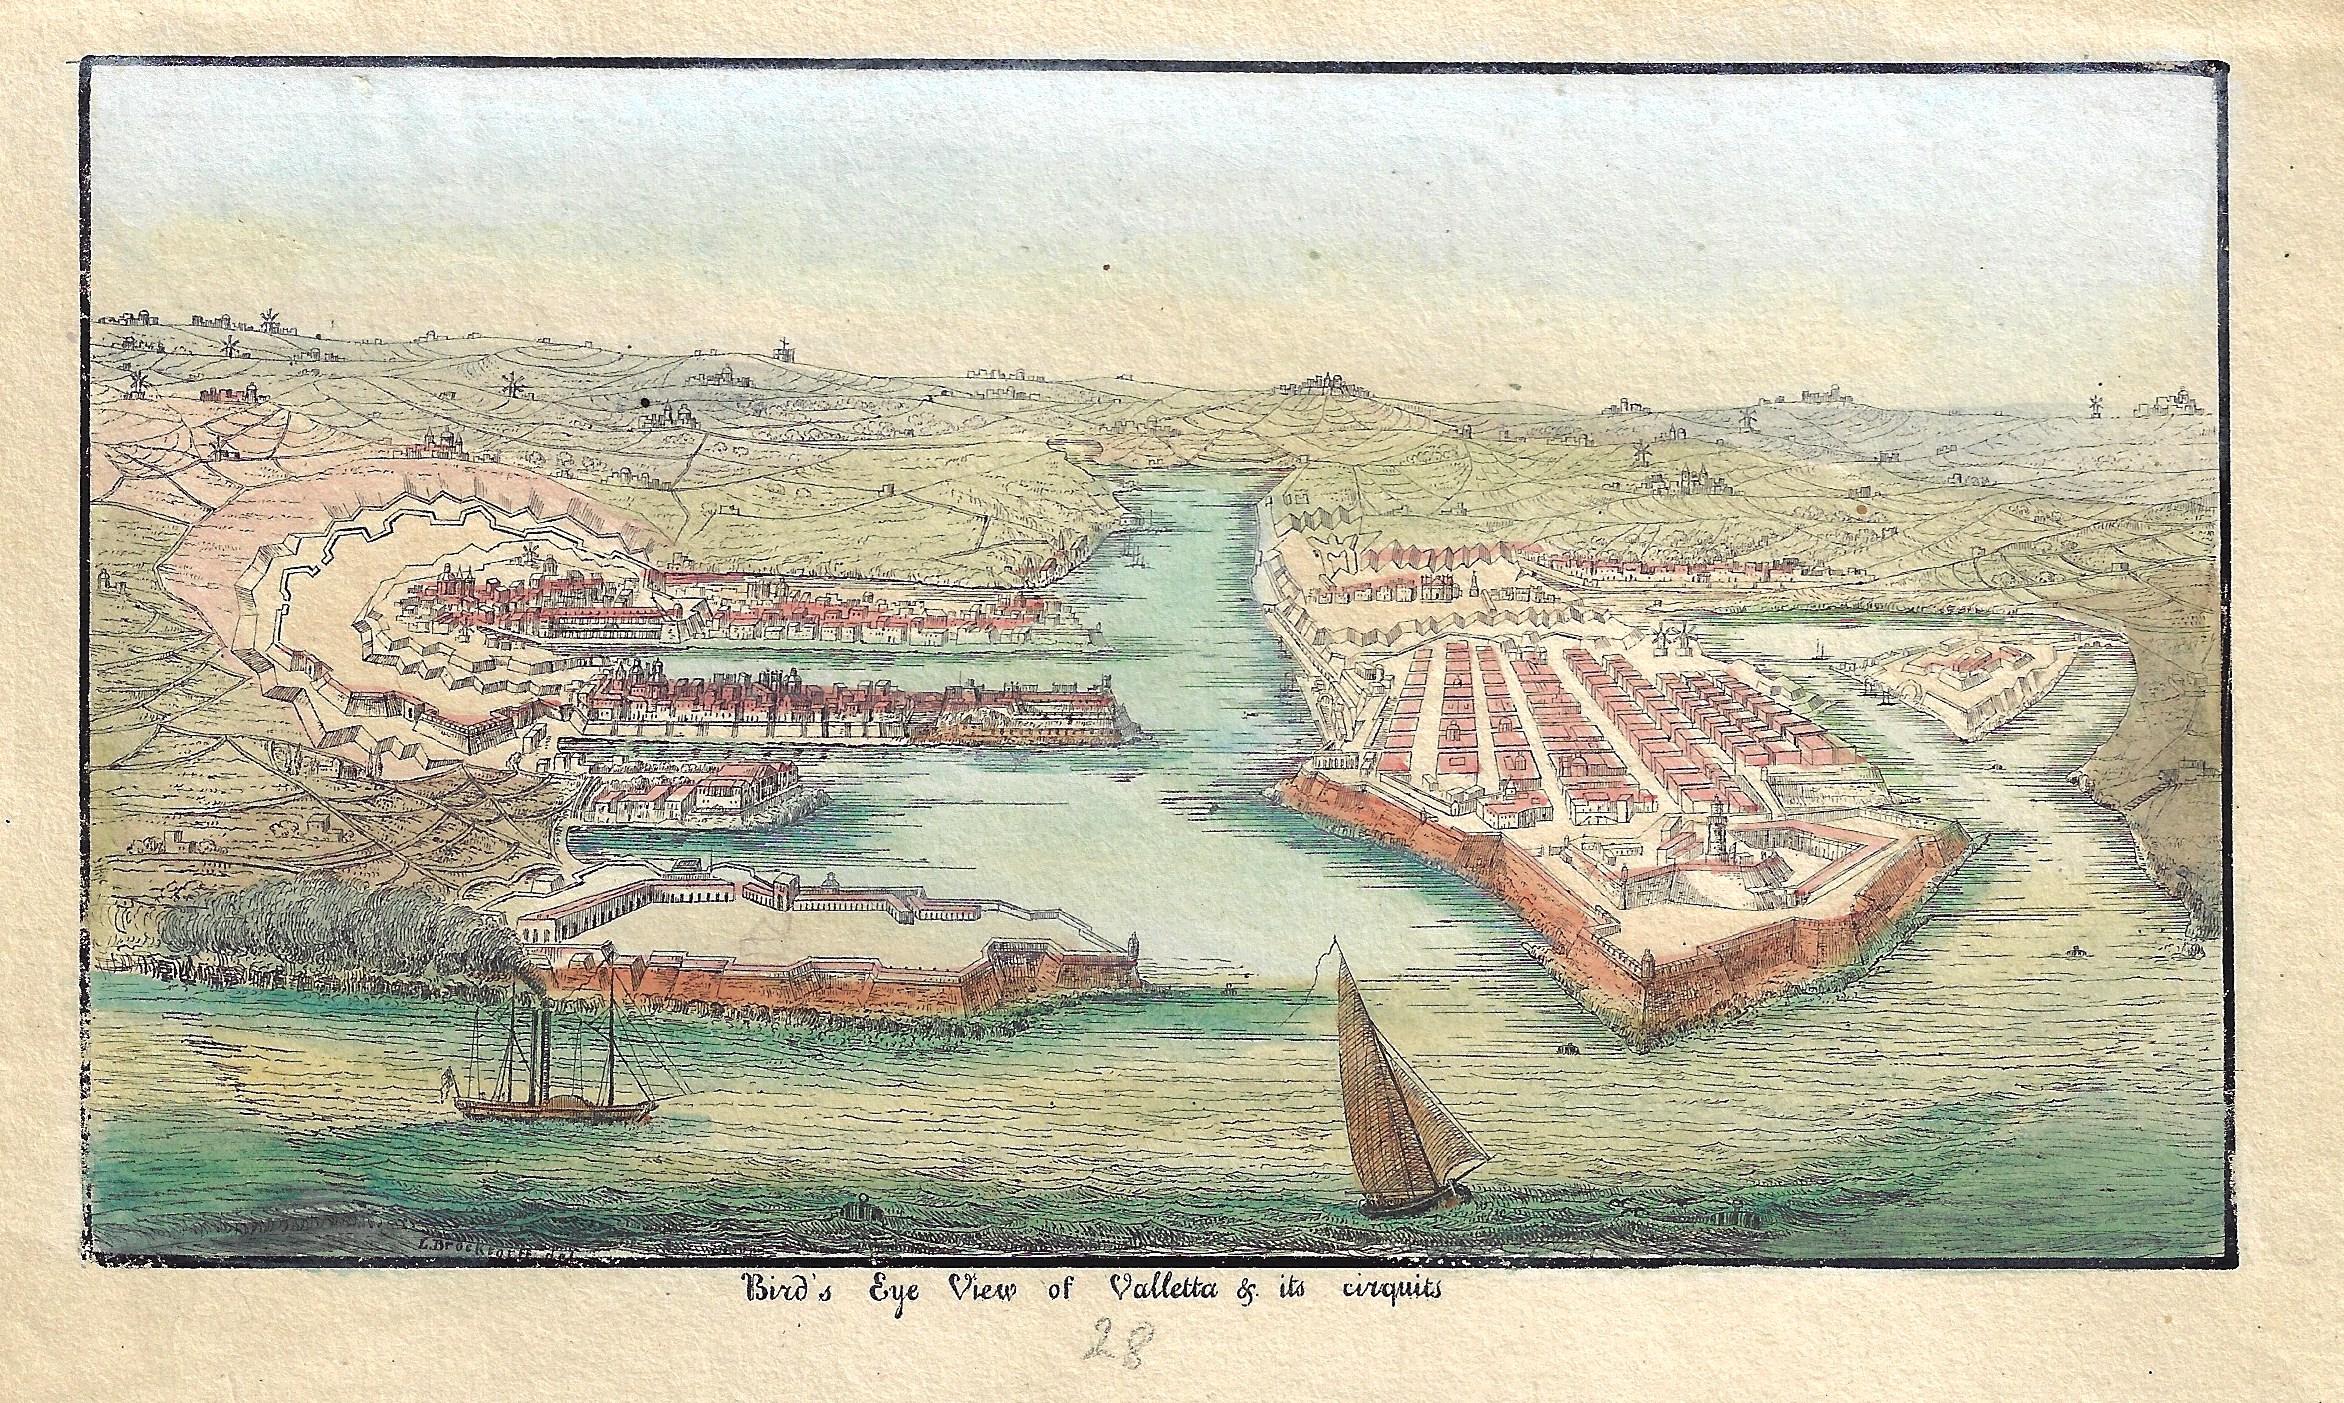 Brocksortt L. Bird's Eye View of Valletta & ist cirquits